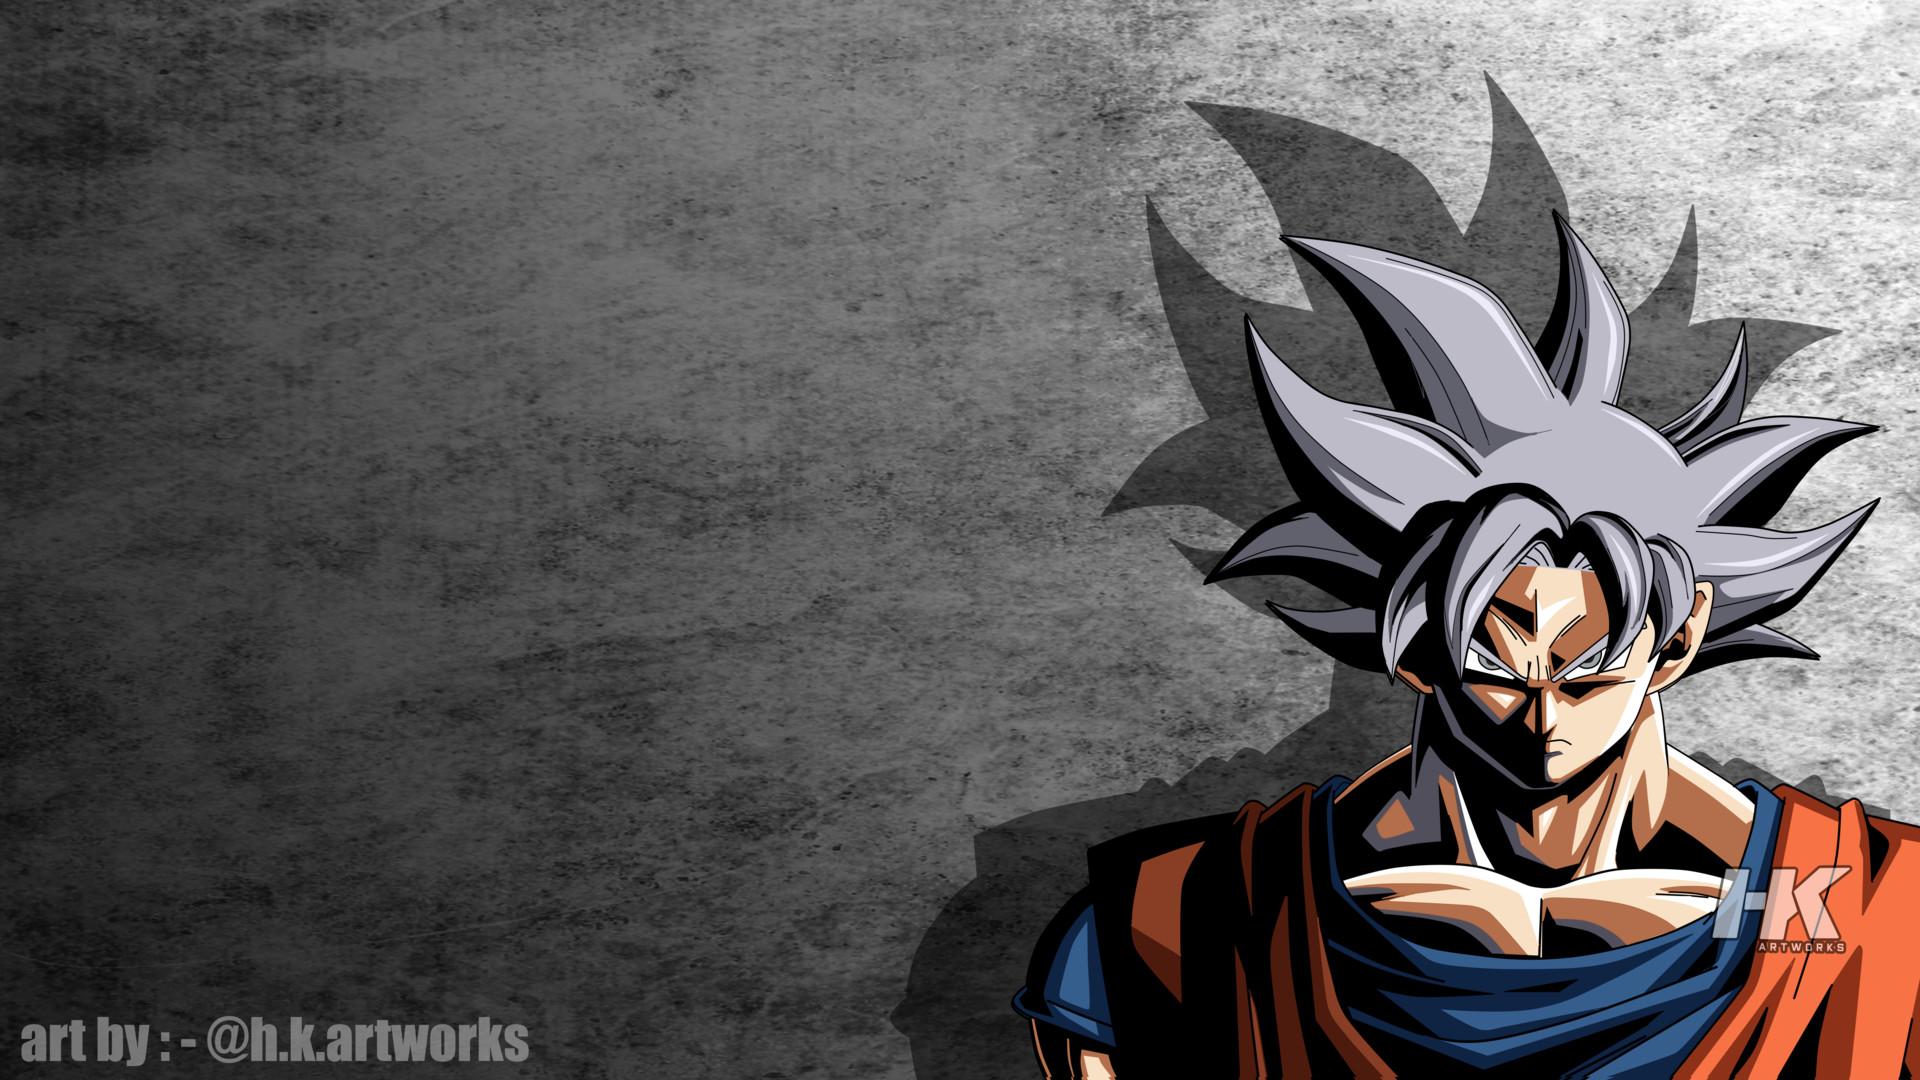 Artstation Goku Mastered Ultra Instinct Xenoverse Style Hk